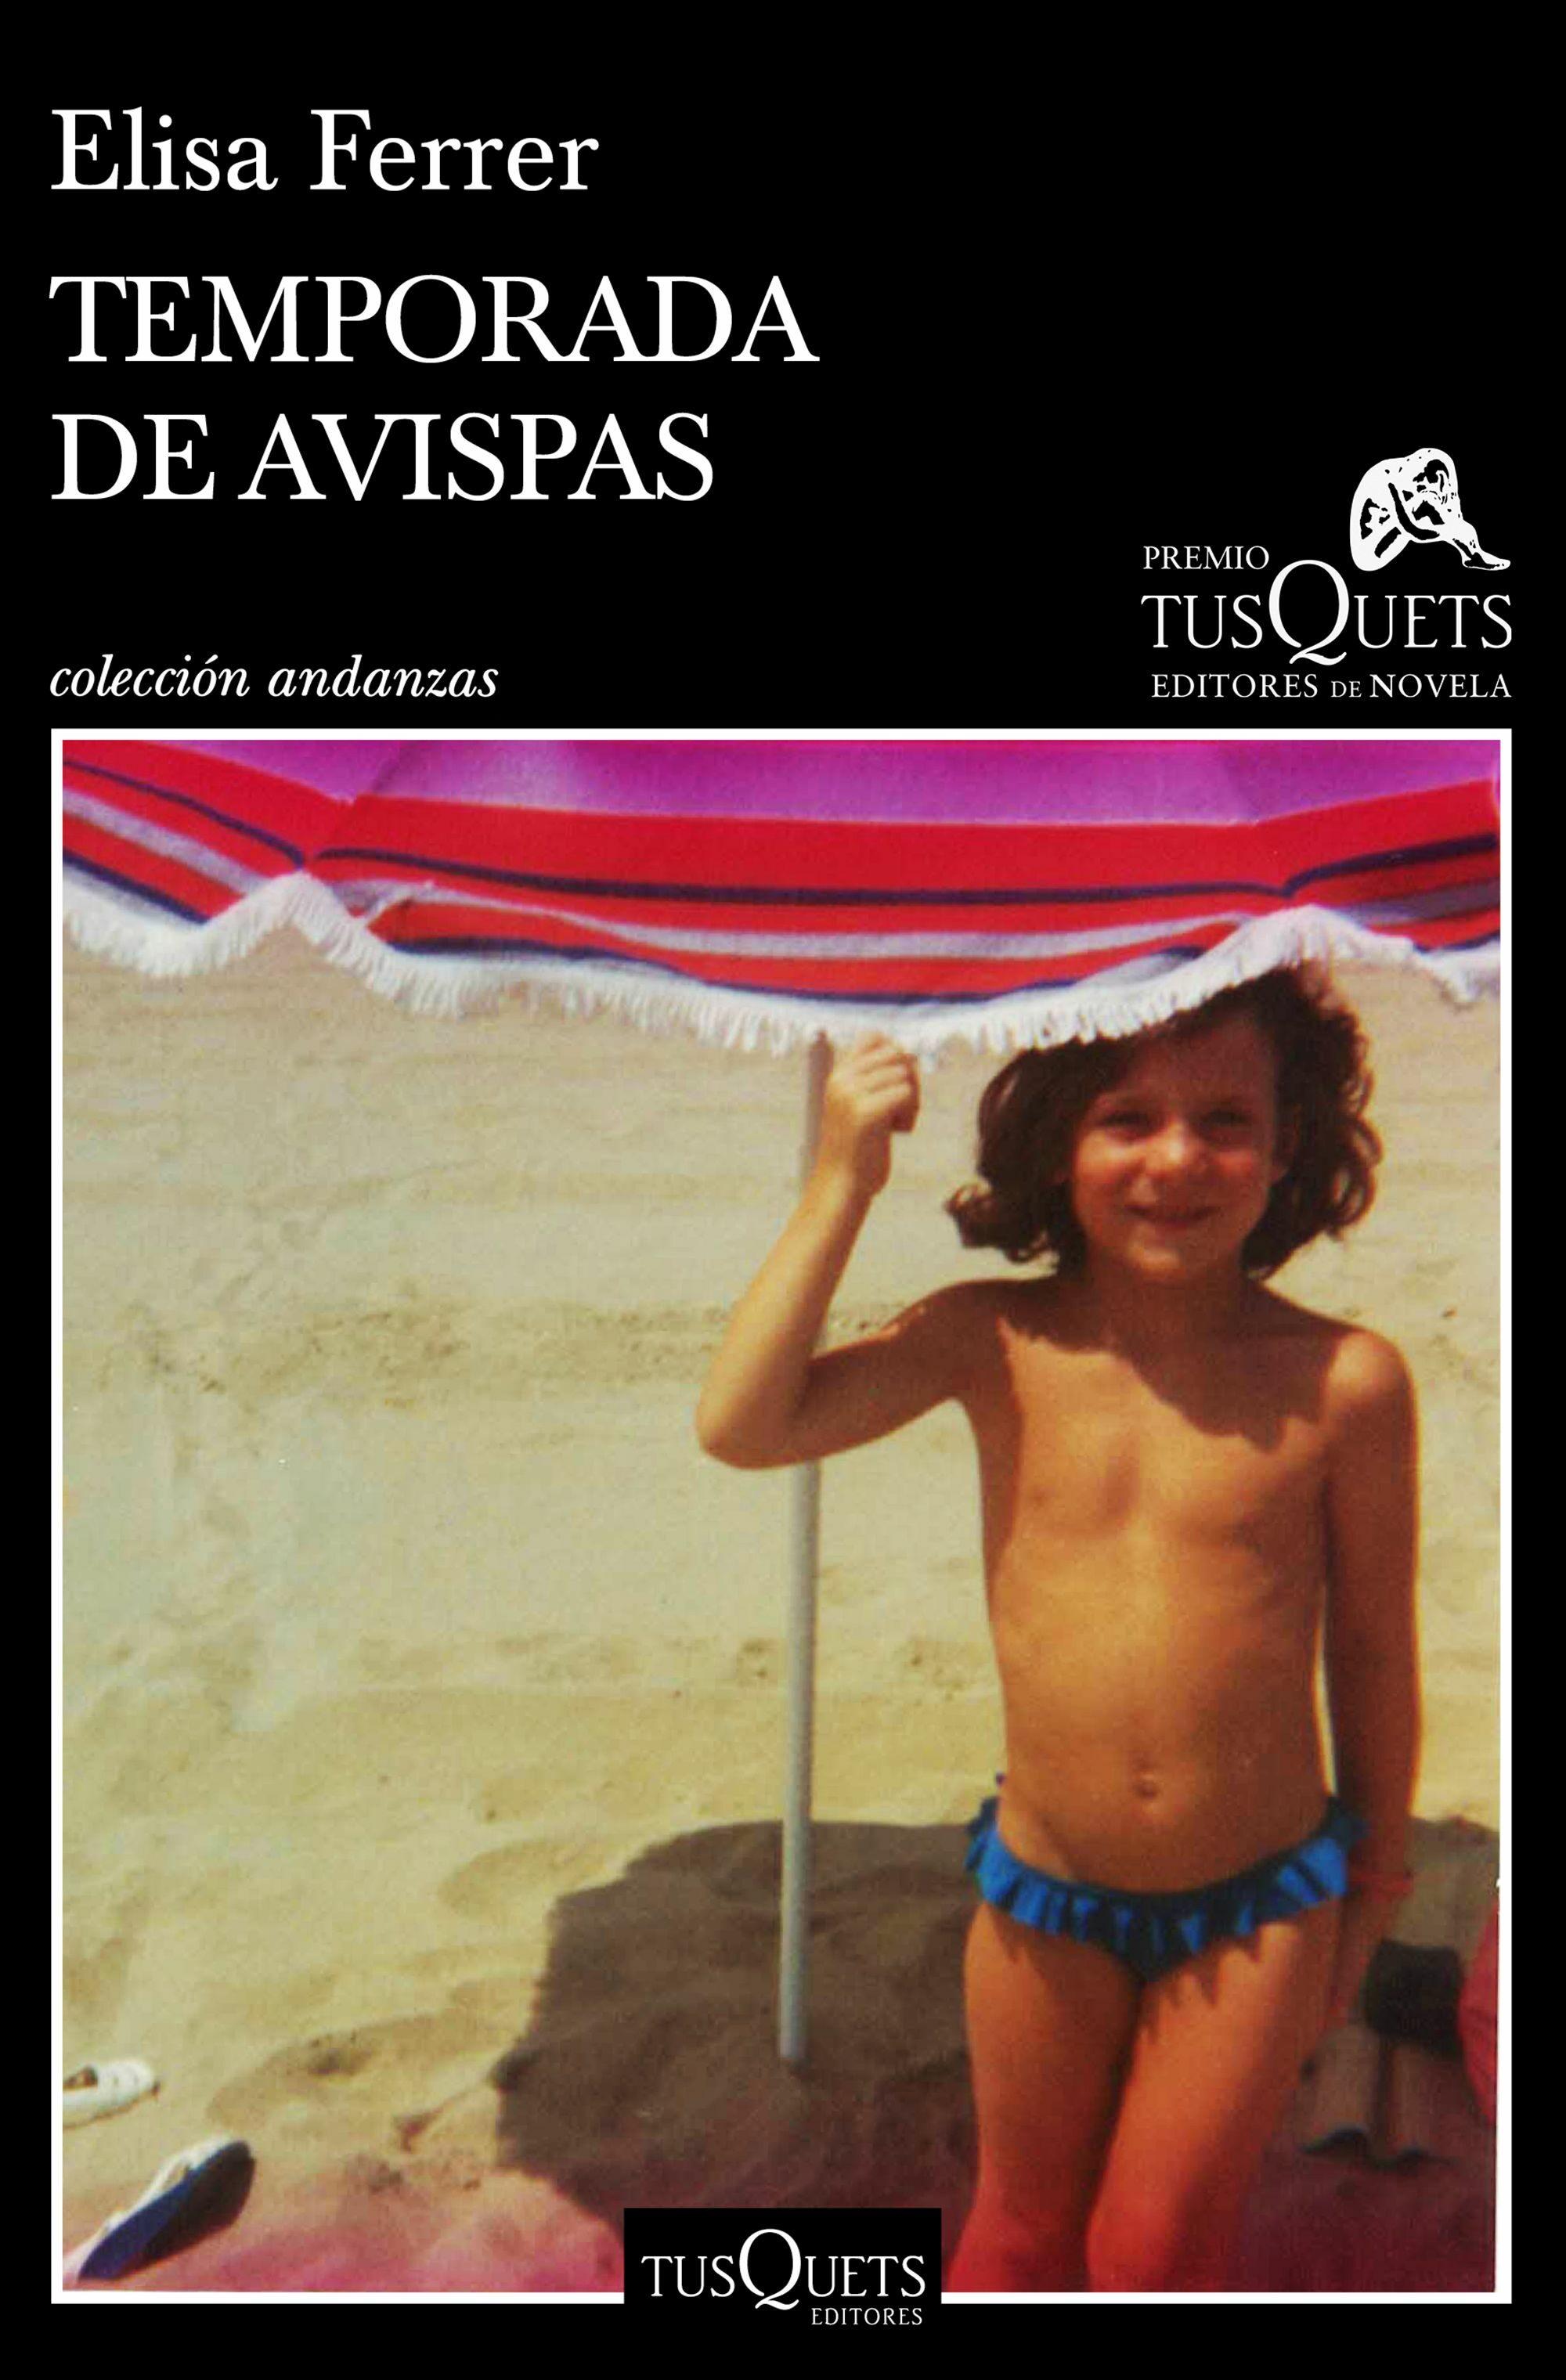 temporada de avispas (xv premio tusquets editores de novela 2019)-elisa ferrer-9788490667545